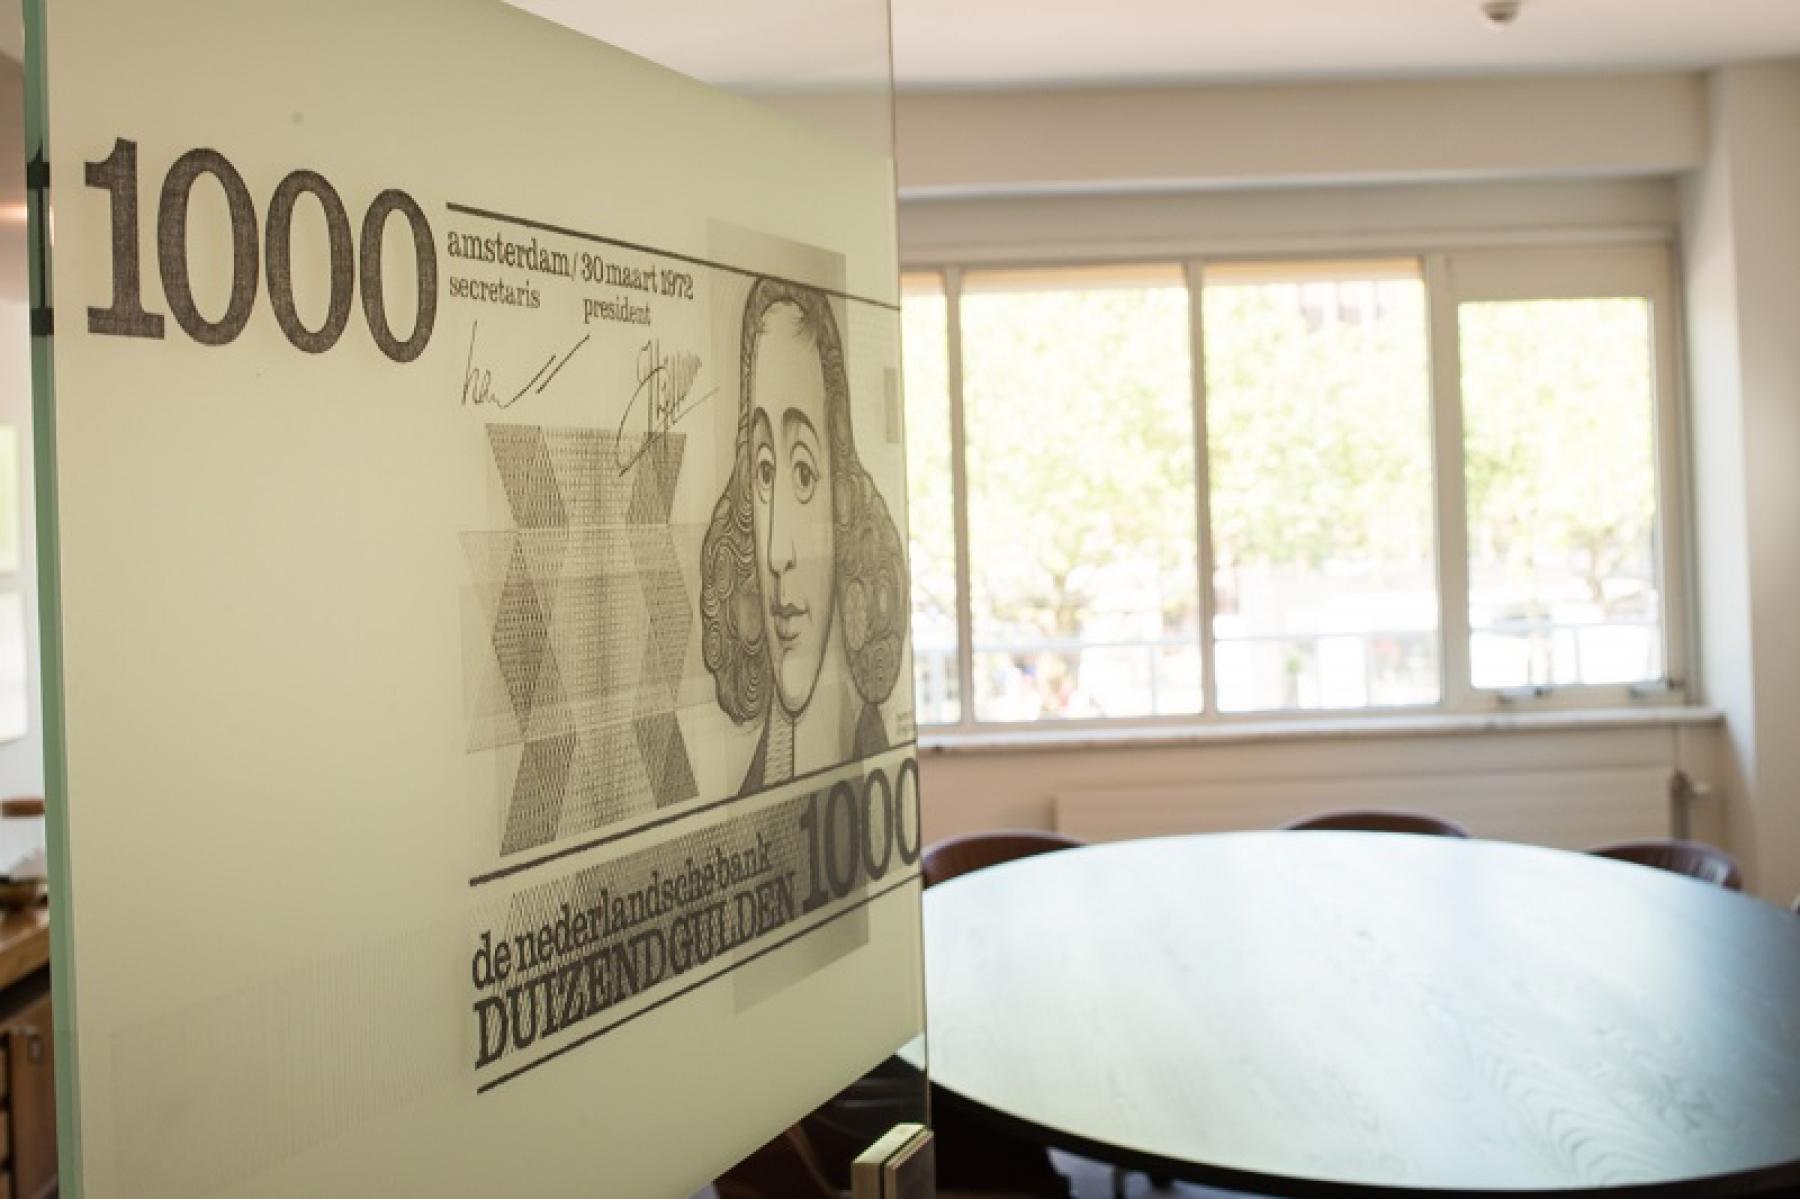 design kantoorgebouw rotterdam coolsingel vergaderruimte